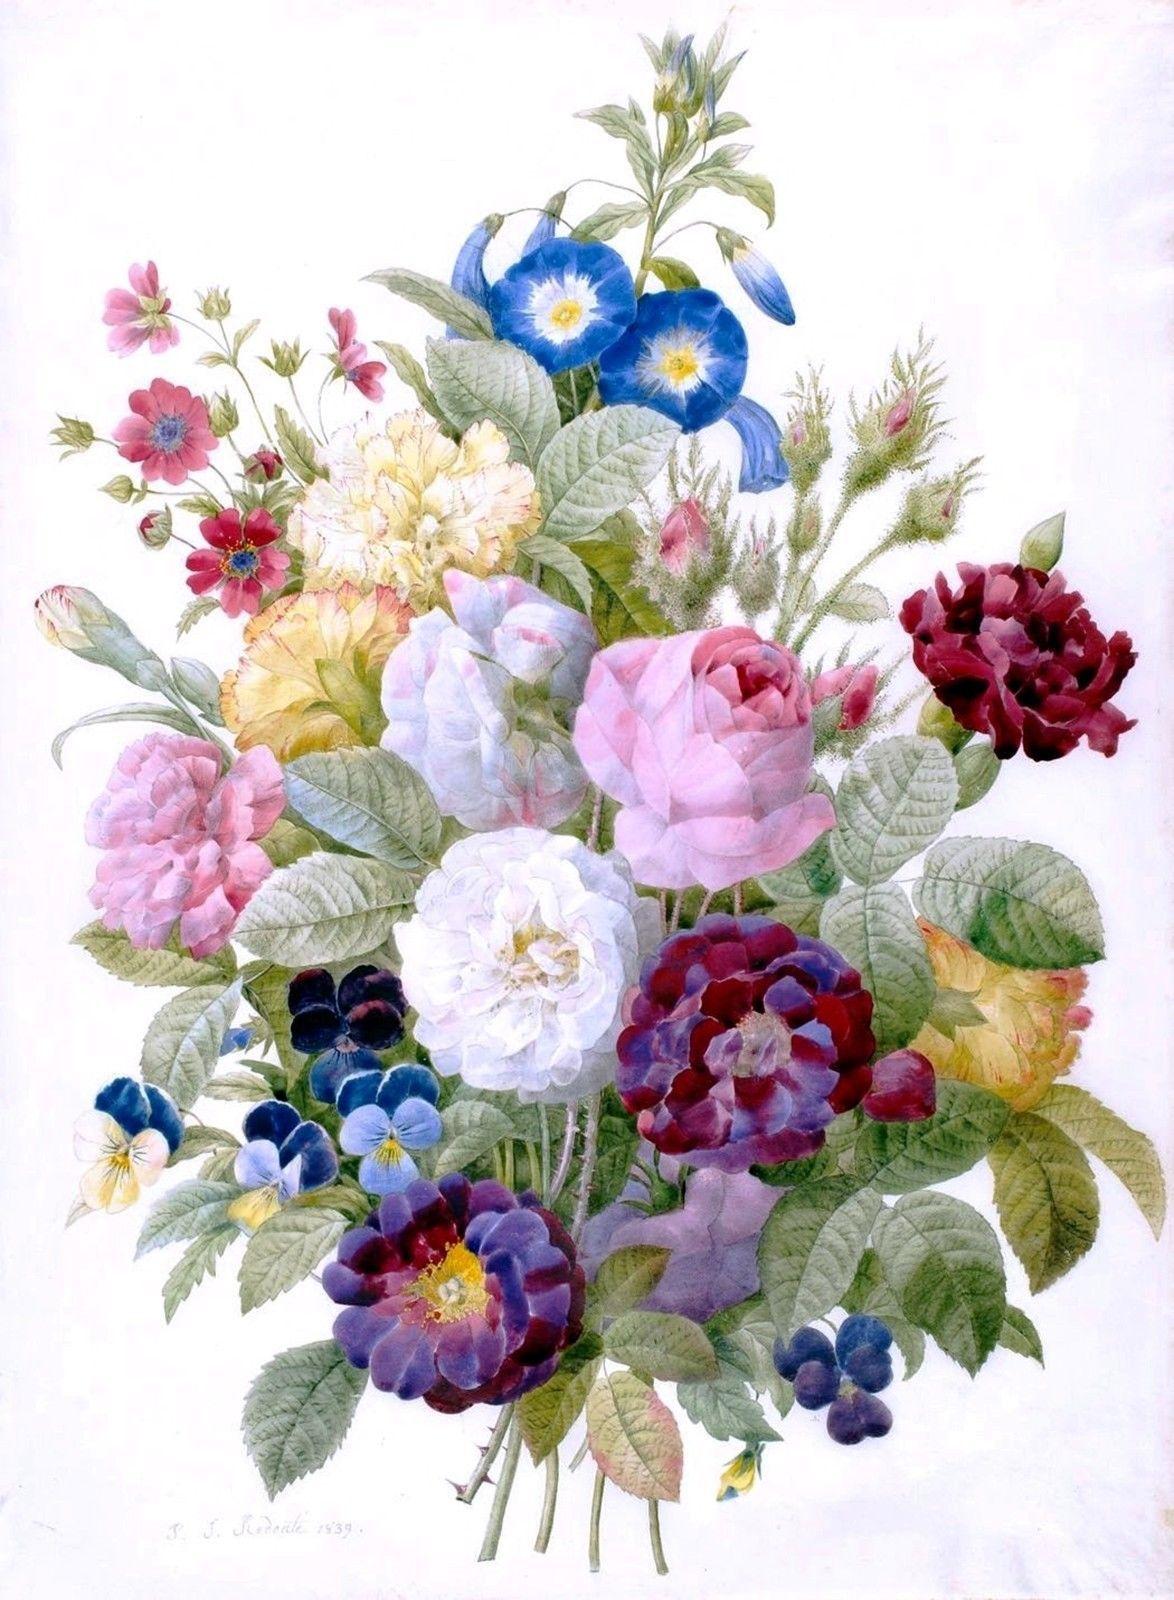 Bouquet of flowerscounted cross stitch pattern 896flower floral bouquet of flowerscounted cross stitch pattern 896flower floral garden chart izmirmasajfo